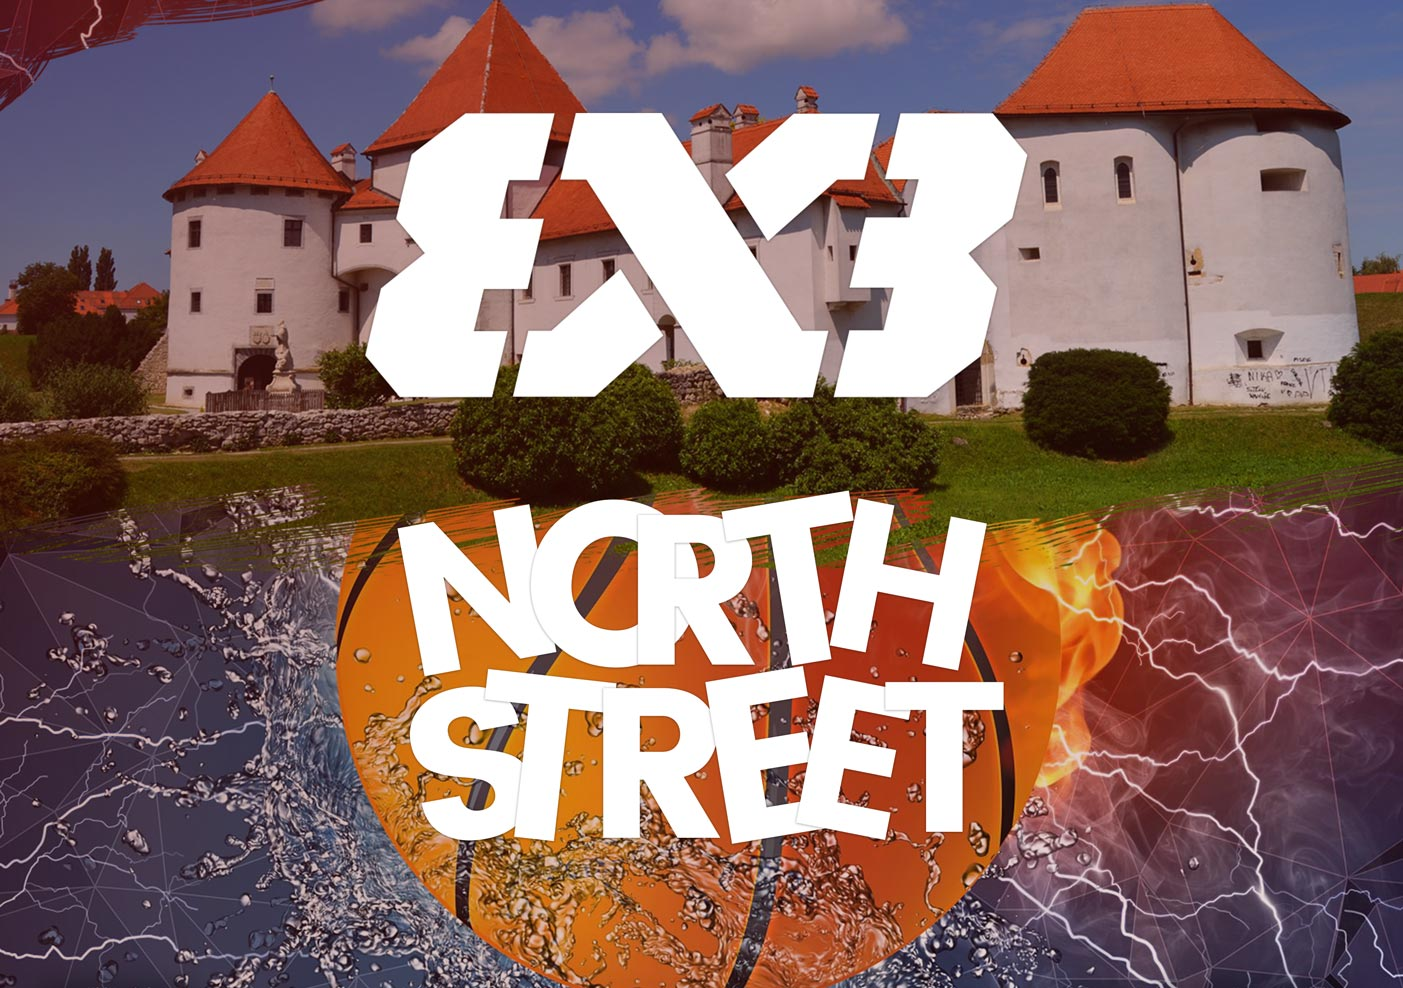 North Street 2019